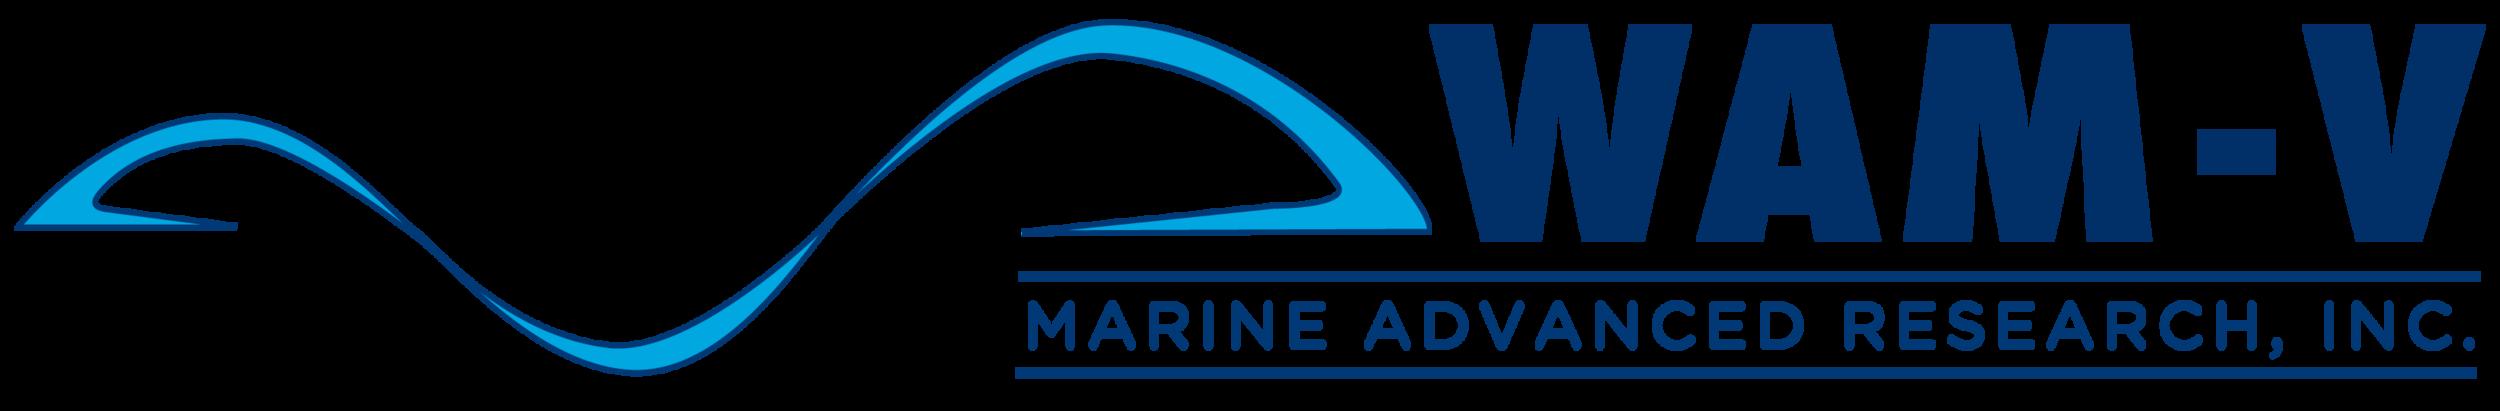 MAR_Full-Logo-PNG24-transparent.png